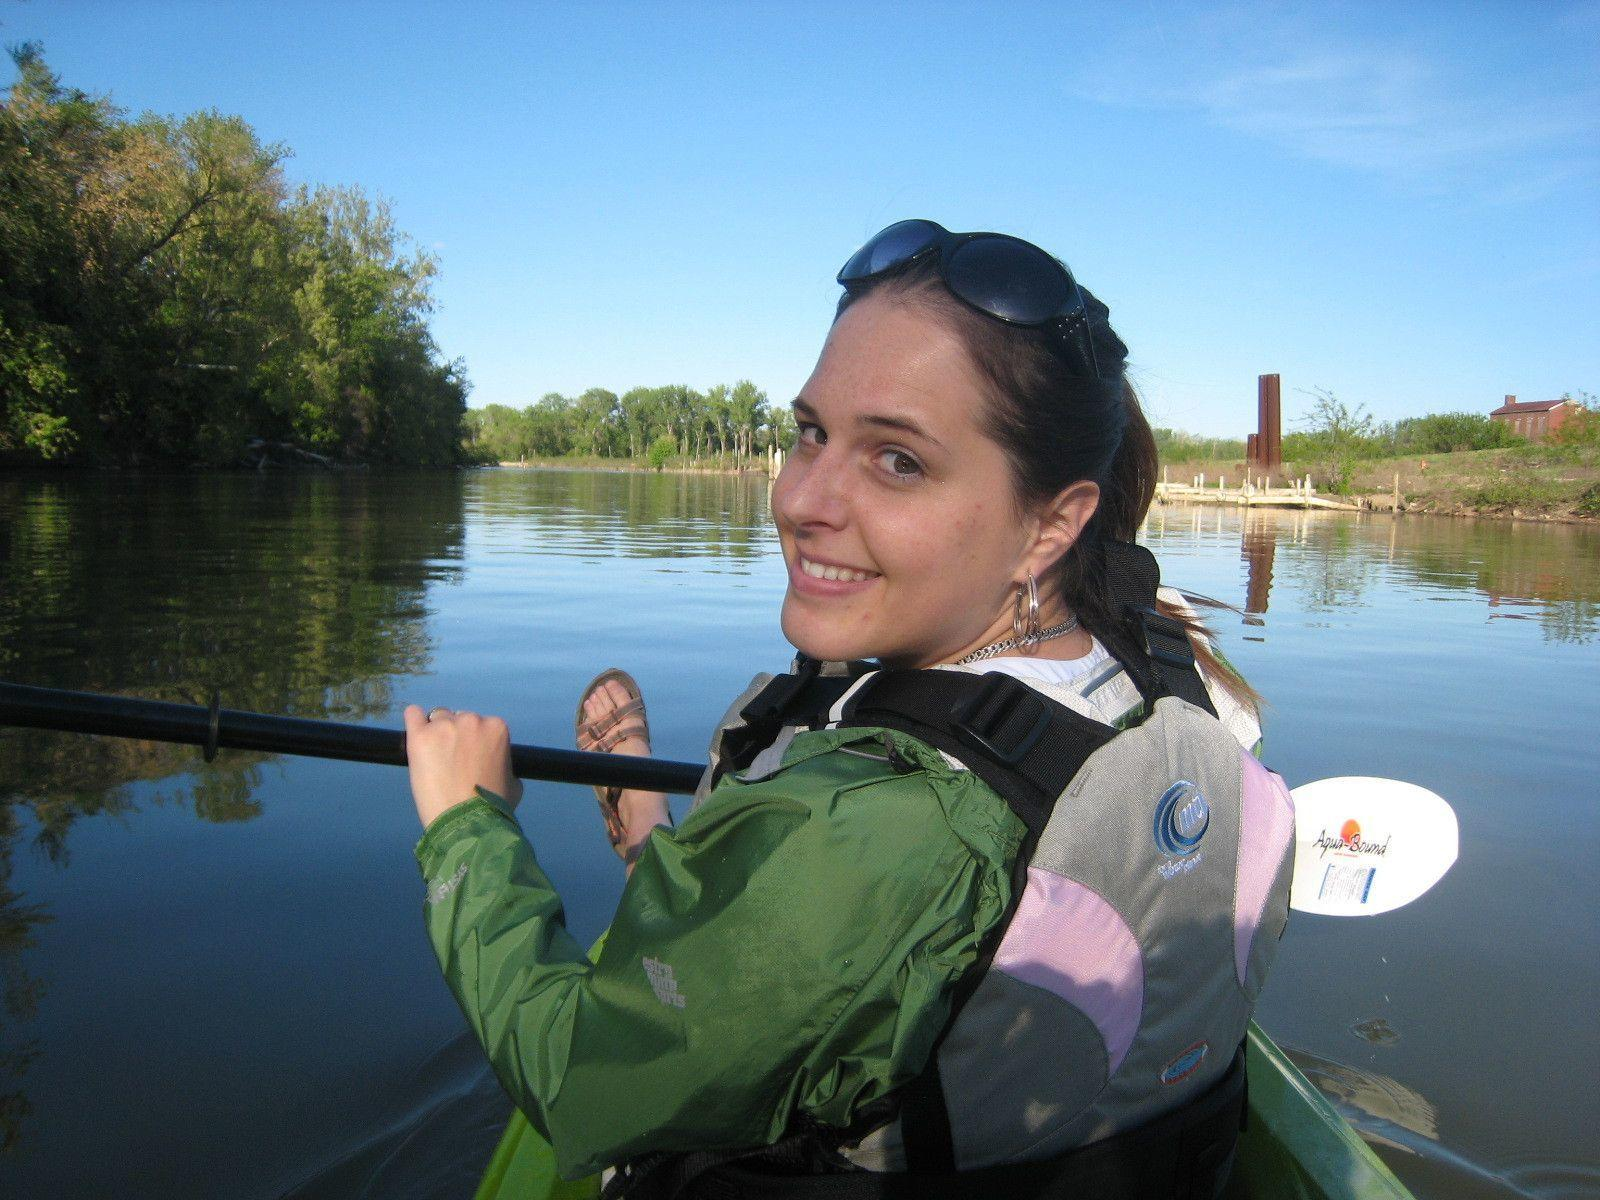 Louisville kayak meetup